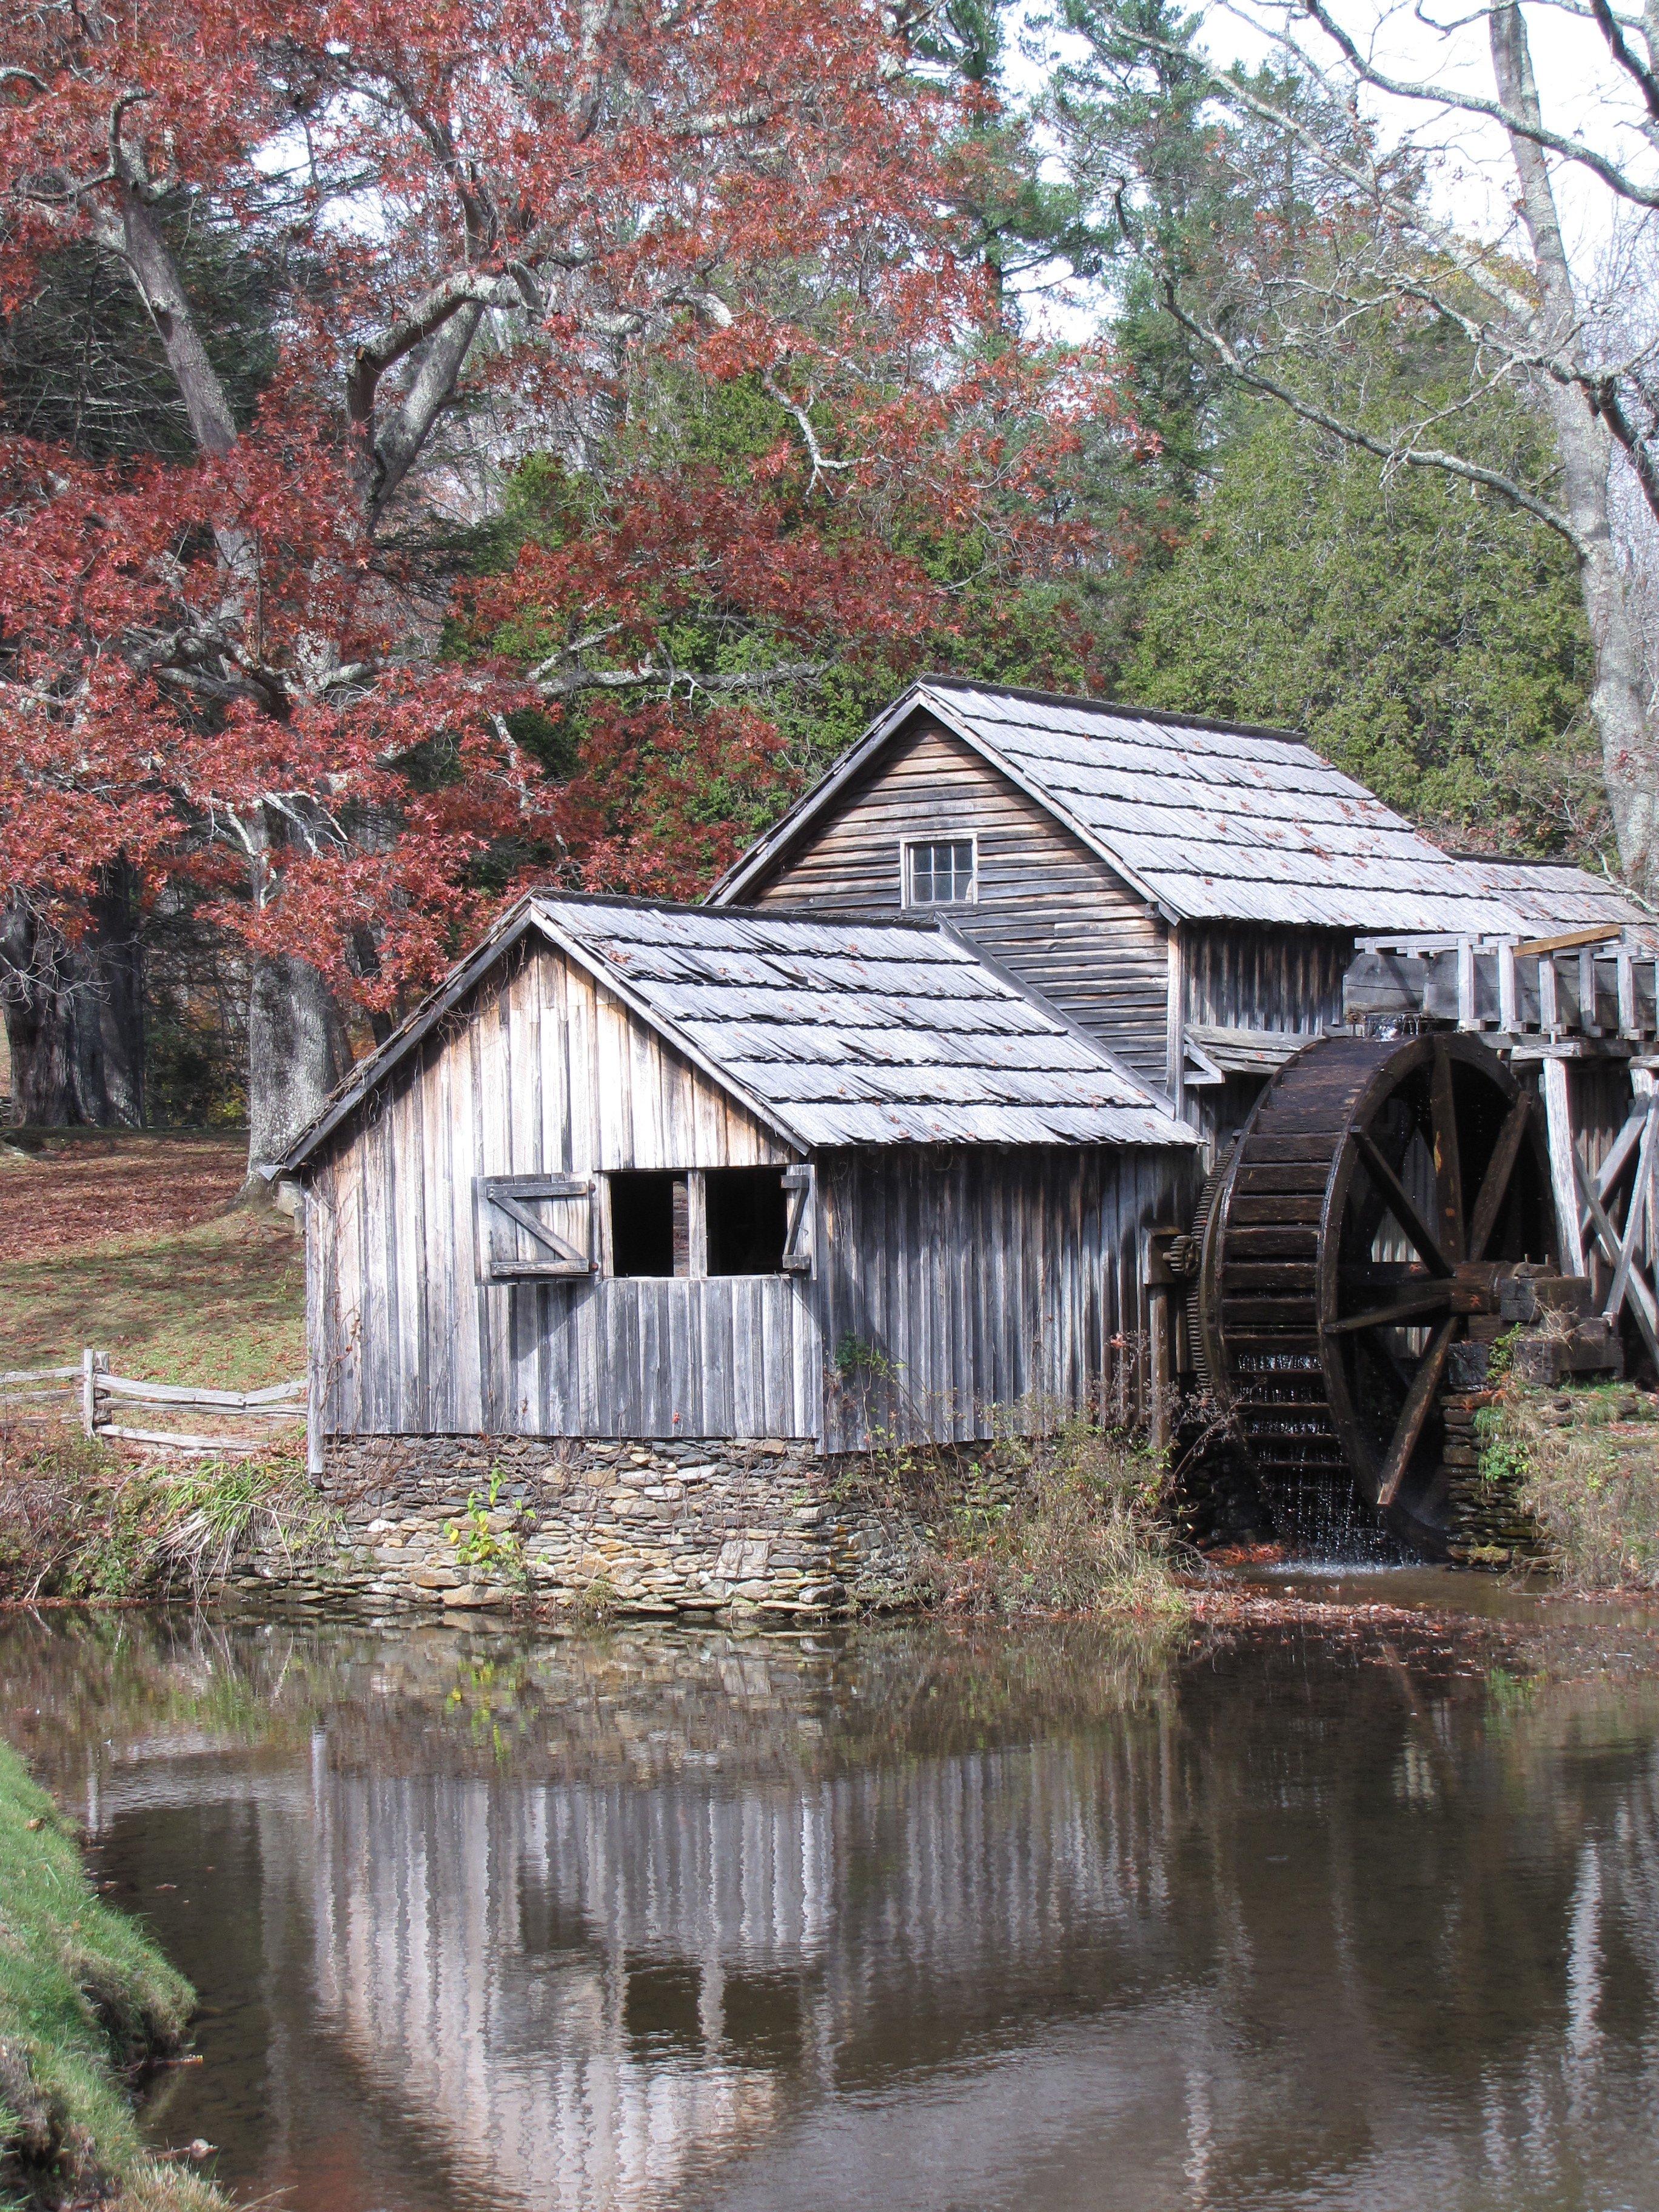 Blue Ridge Parkway Trip – Day 4 (part 1): Mabry Mill